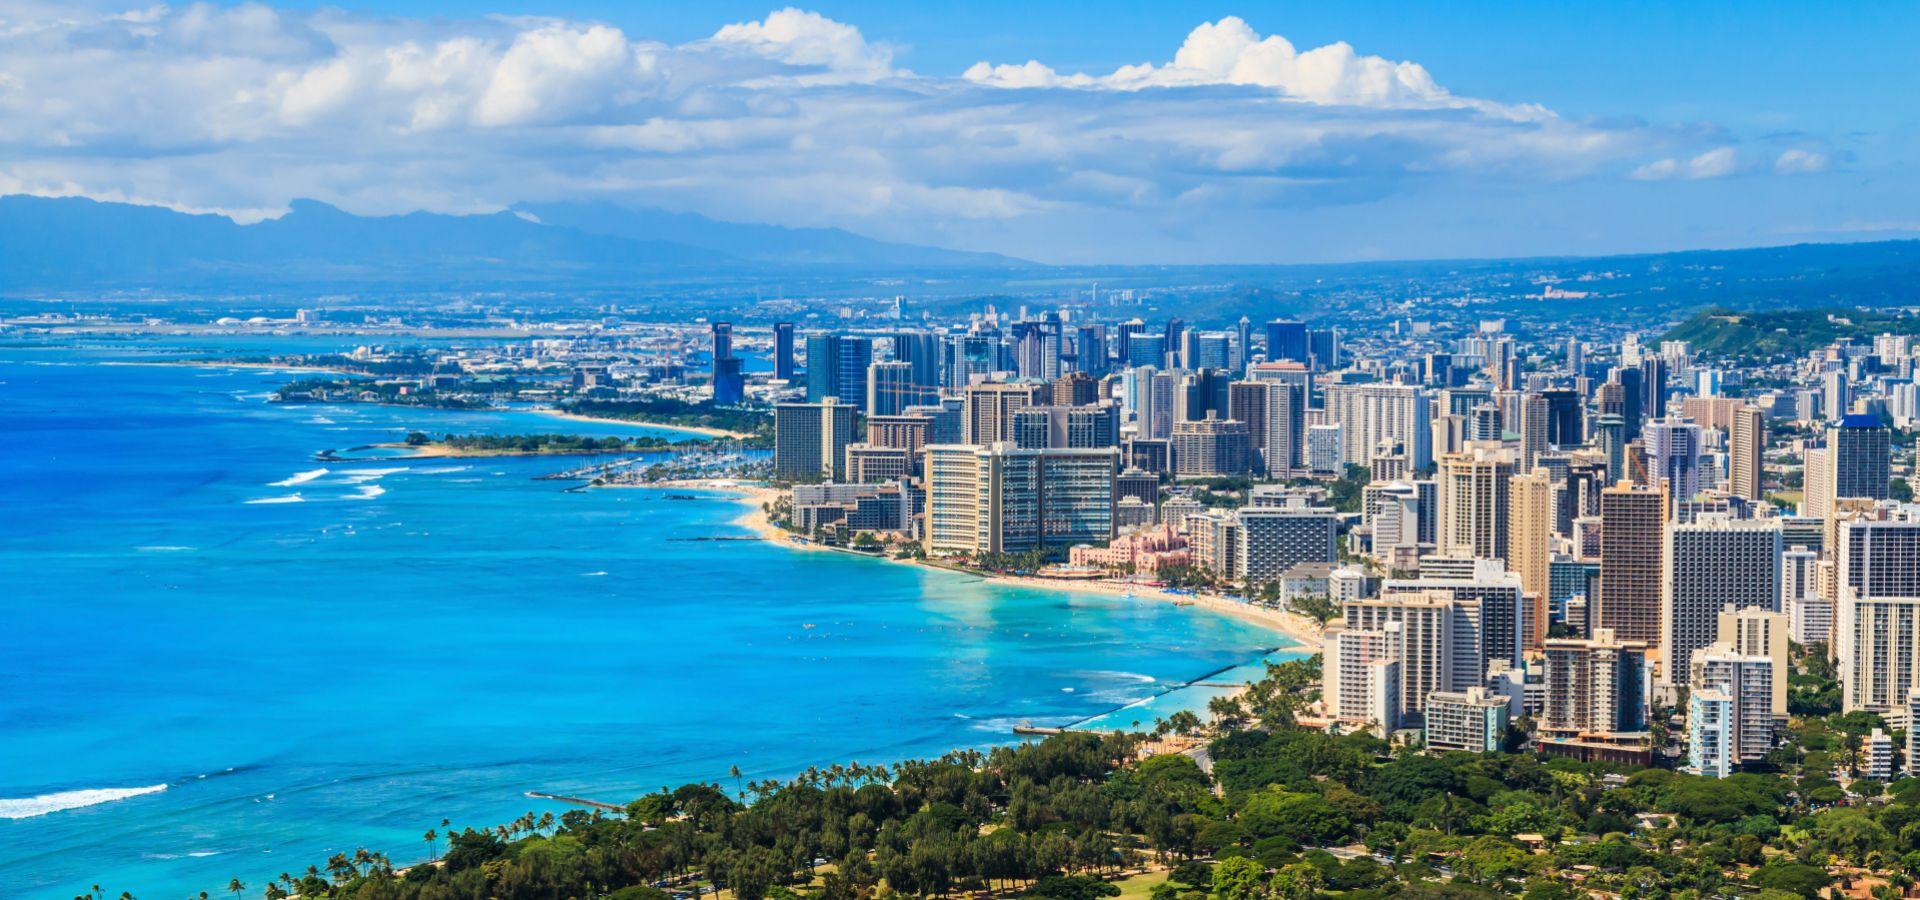 Autocad Civil 3D Classes in Honolulu, HI